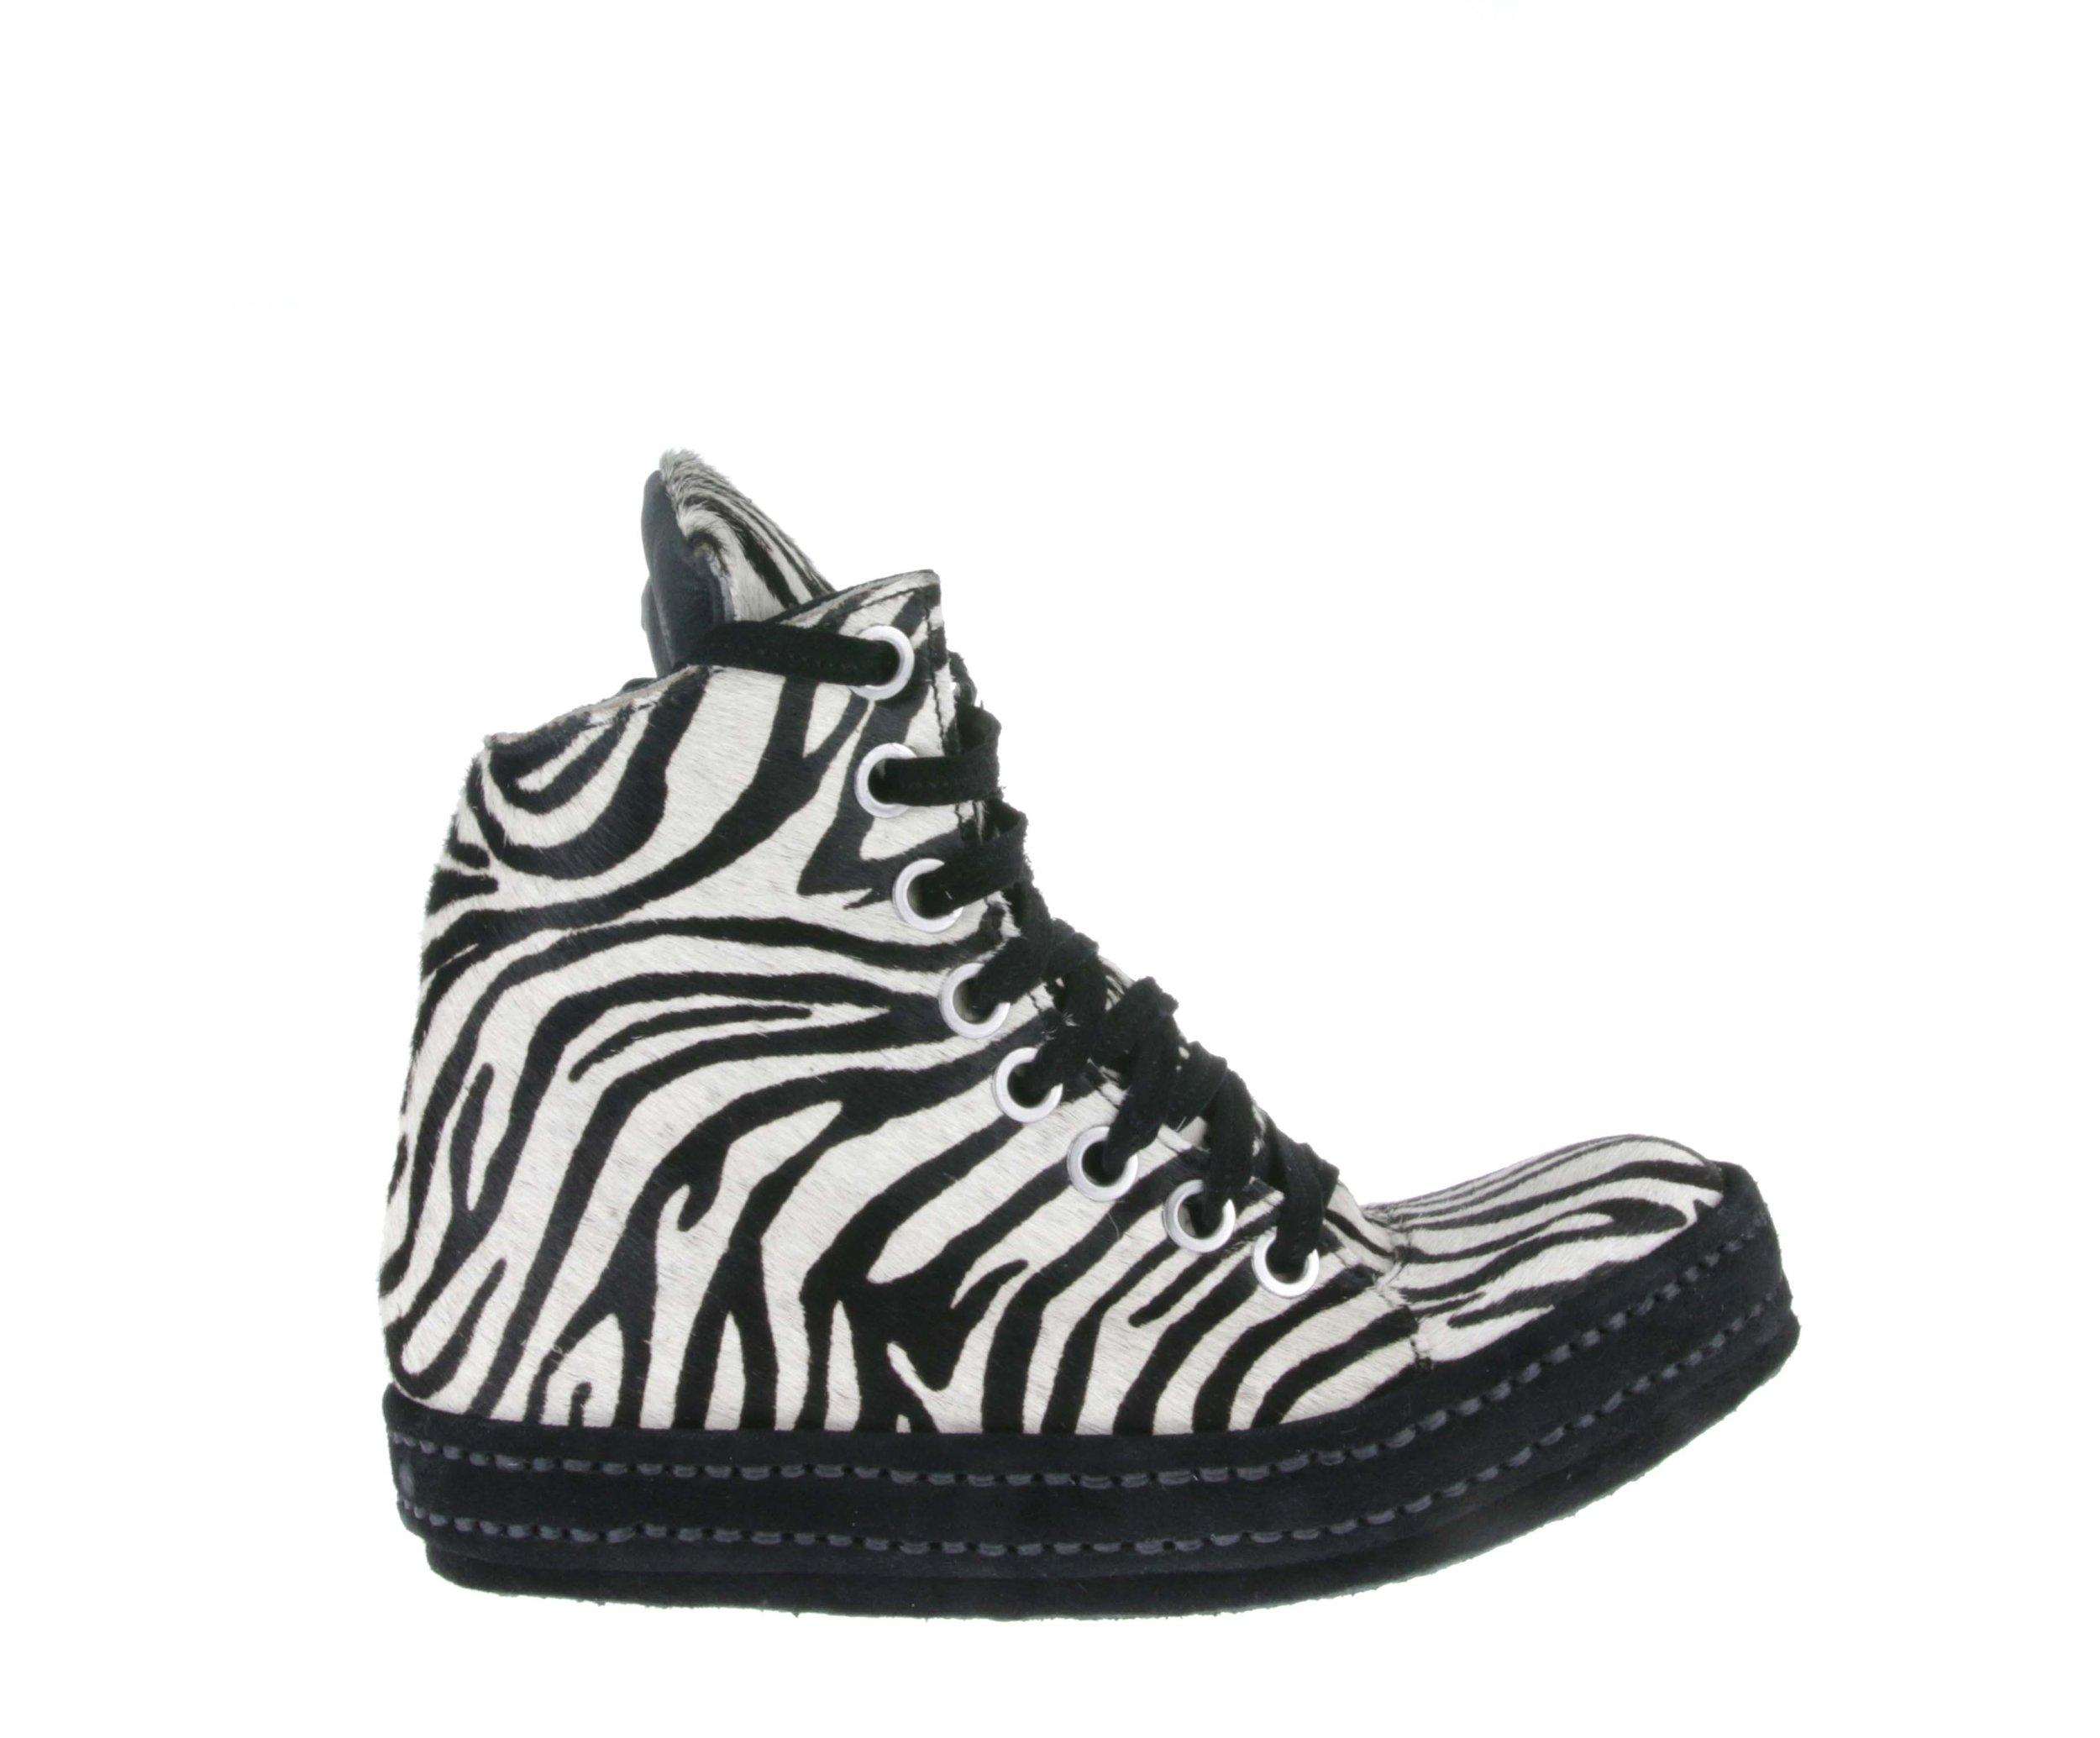 8Hole Zebra Outside.jpg